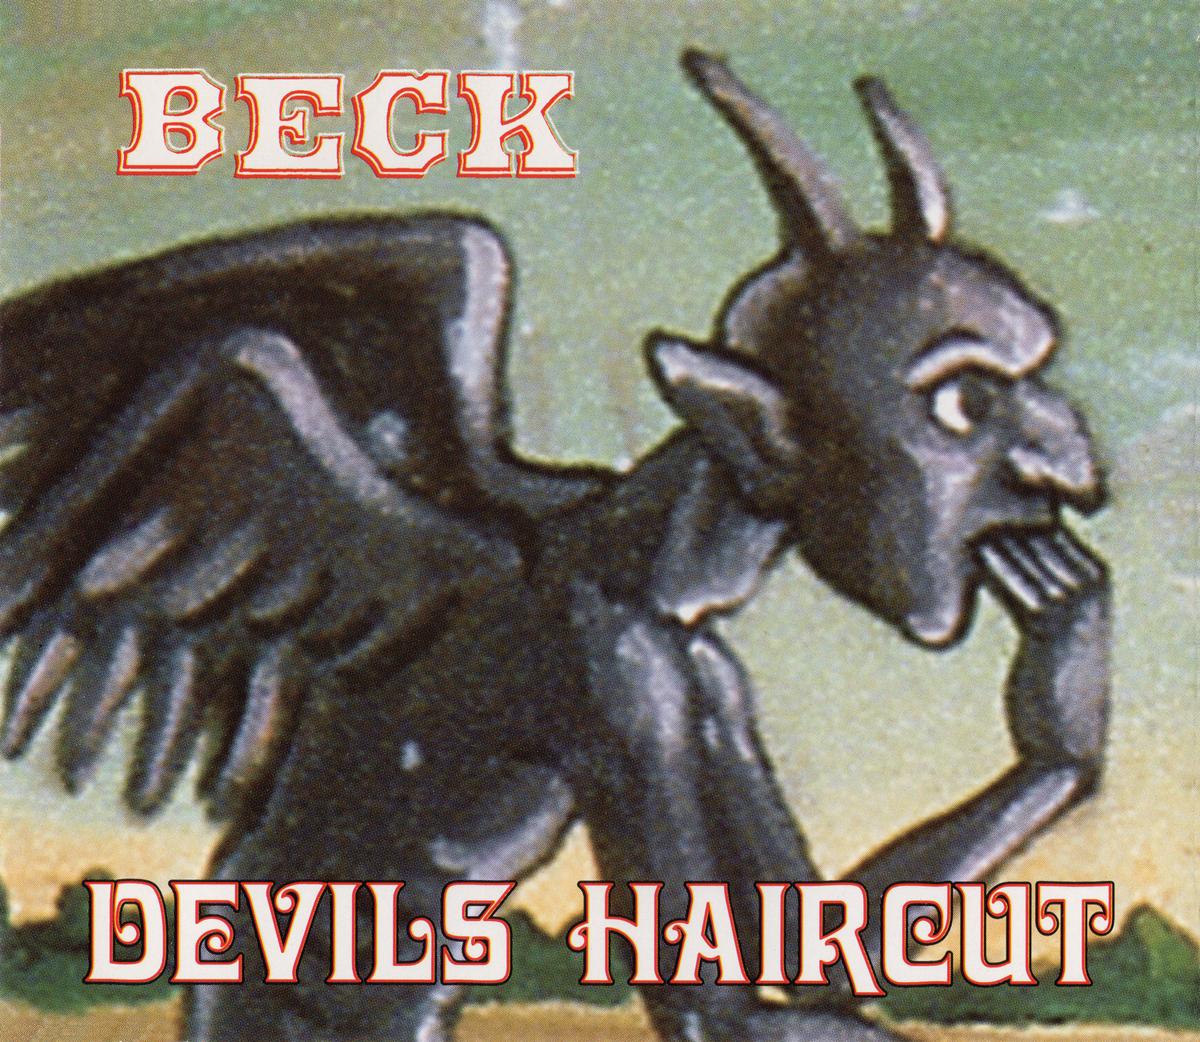 BECK (ベック)『DEVILS HAIRCUT』UK盤 (GFSXD 22183) 高画質ジャケット画像